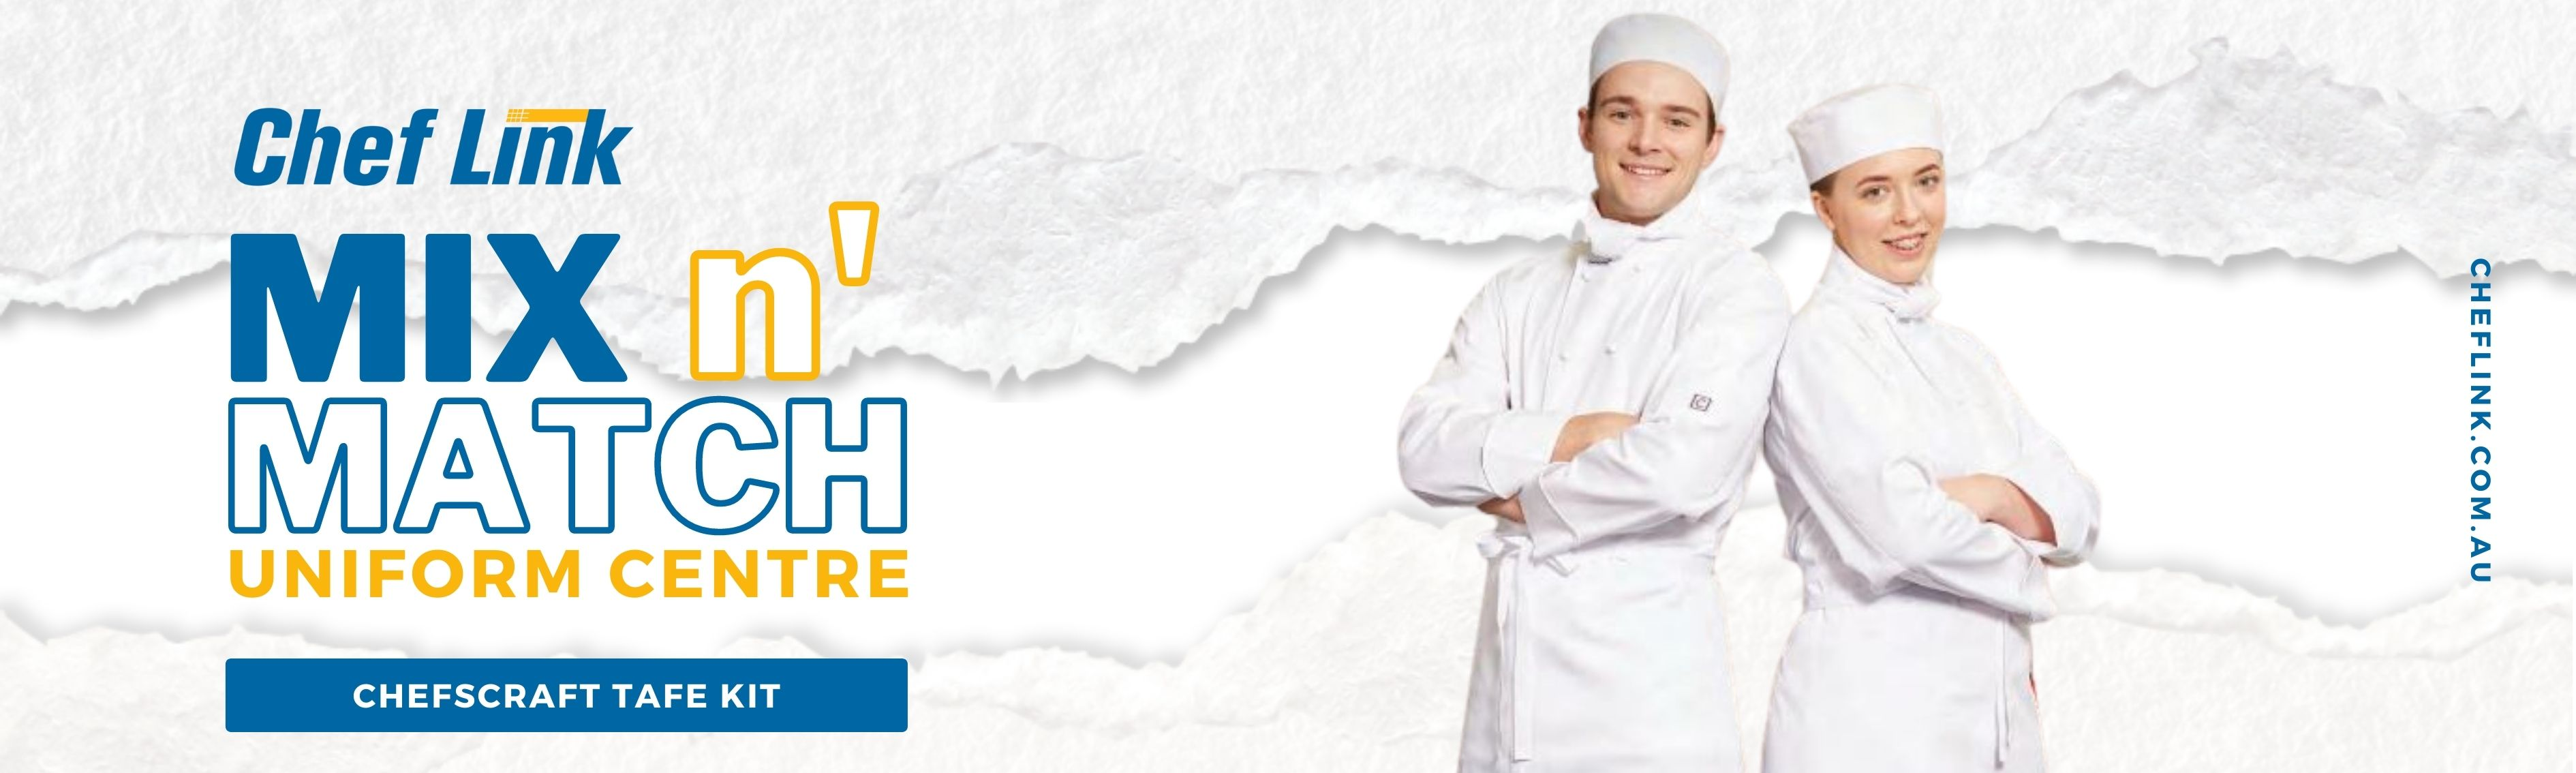 Mix n match chefscraft kit